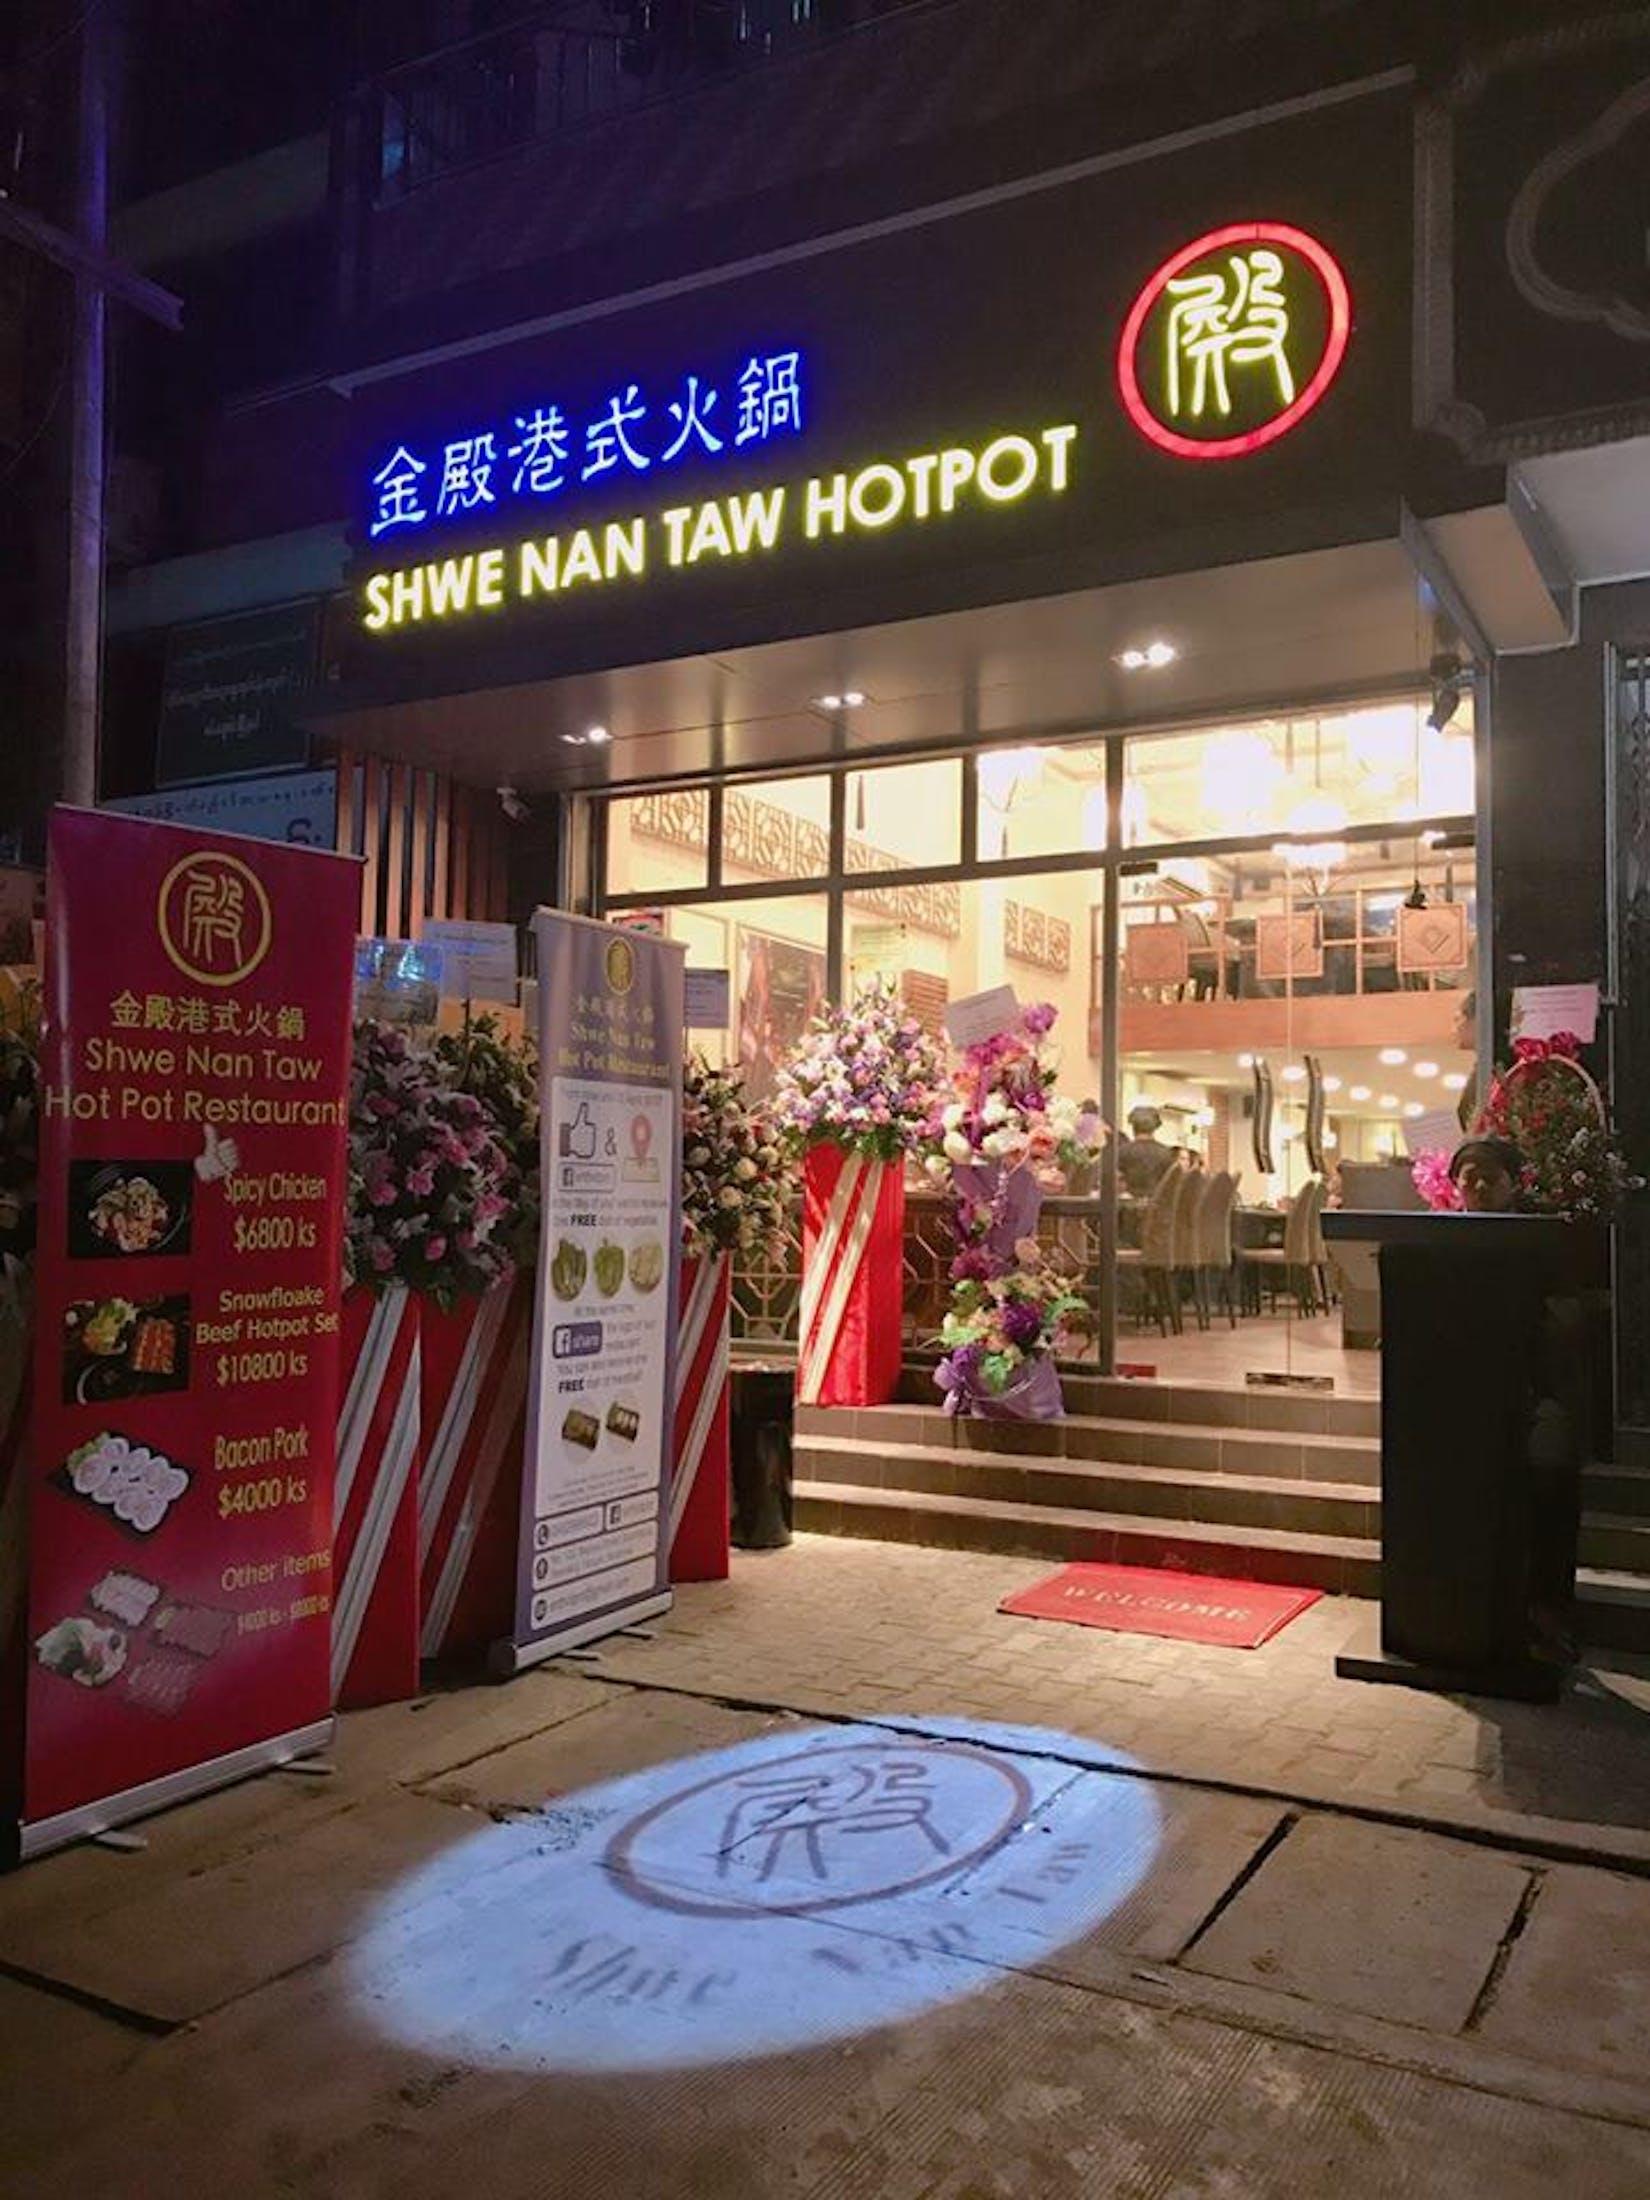 Shwe Nan Taw Hot Pot Restaurant | yathar